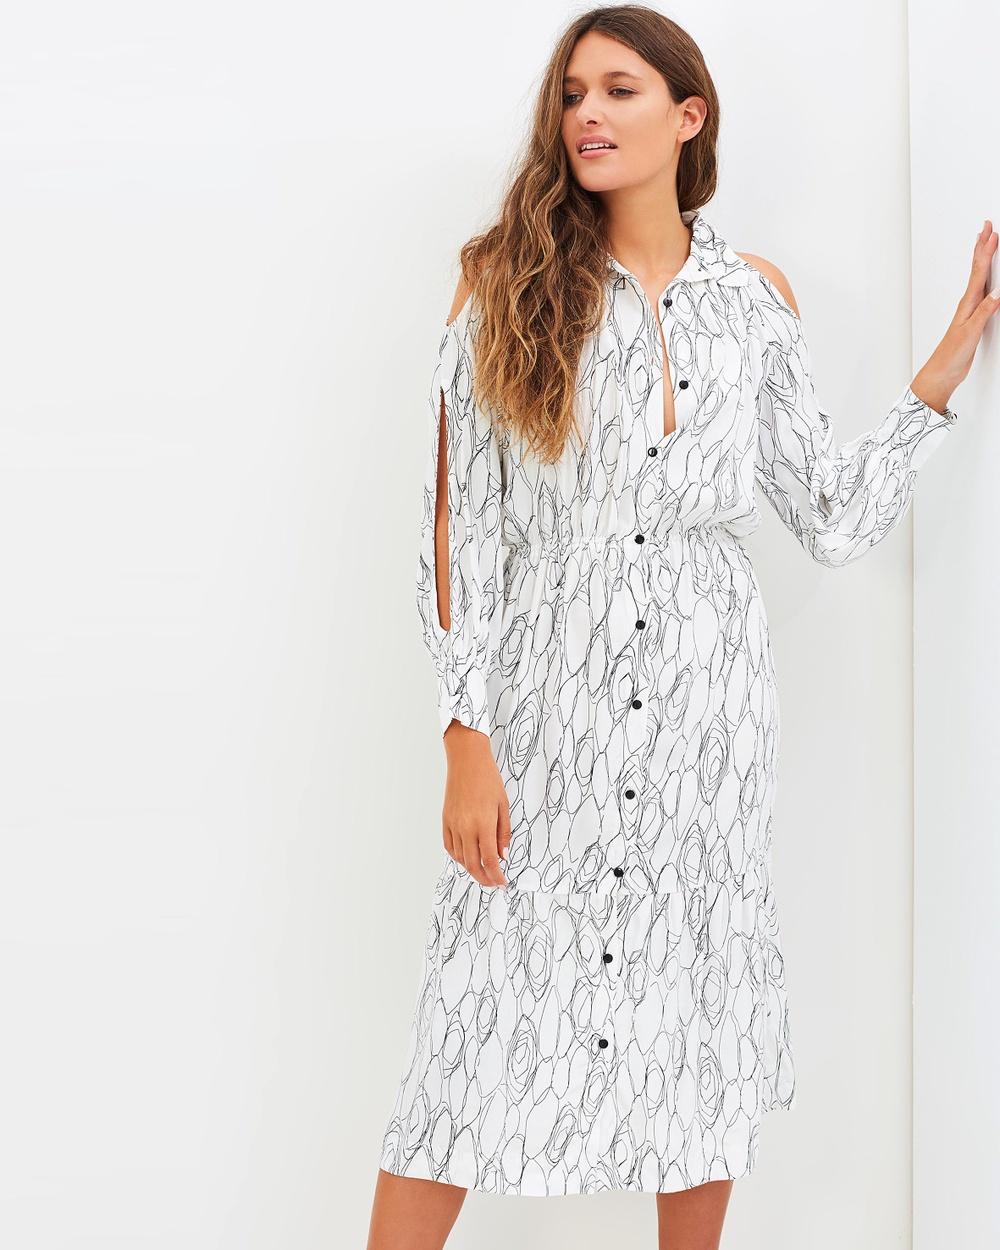 S-W-F Giselle Dress Dresses Monochromatic Print Giselle Dress